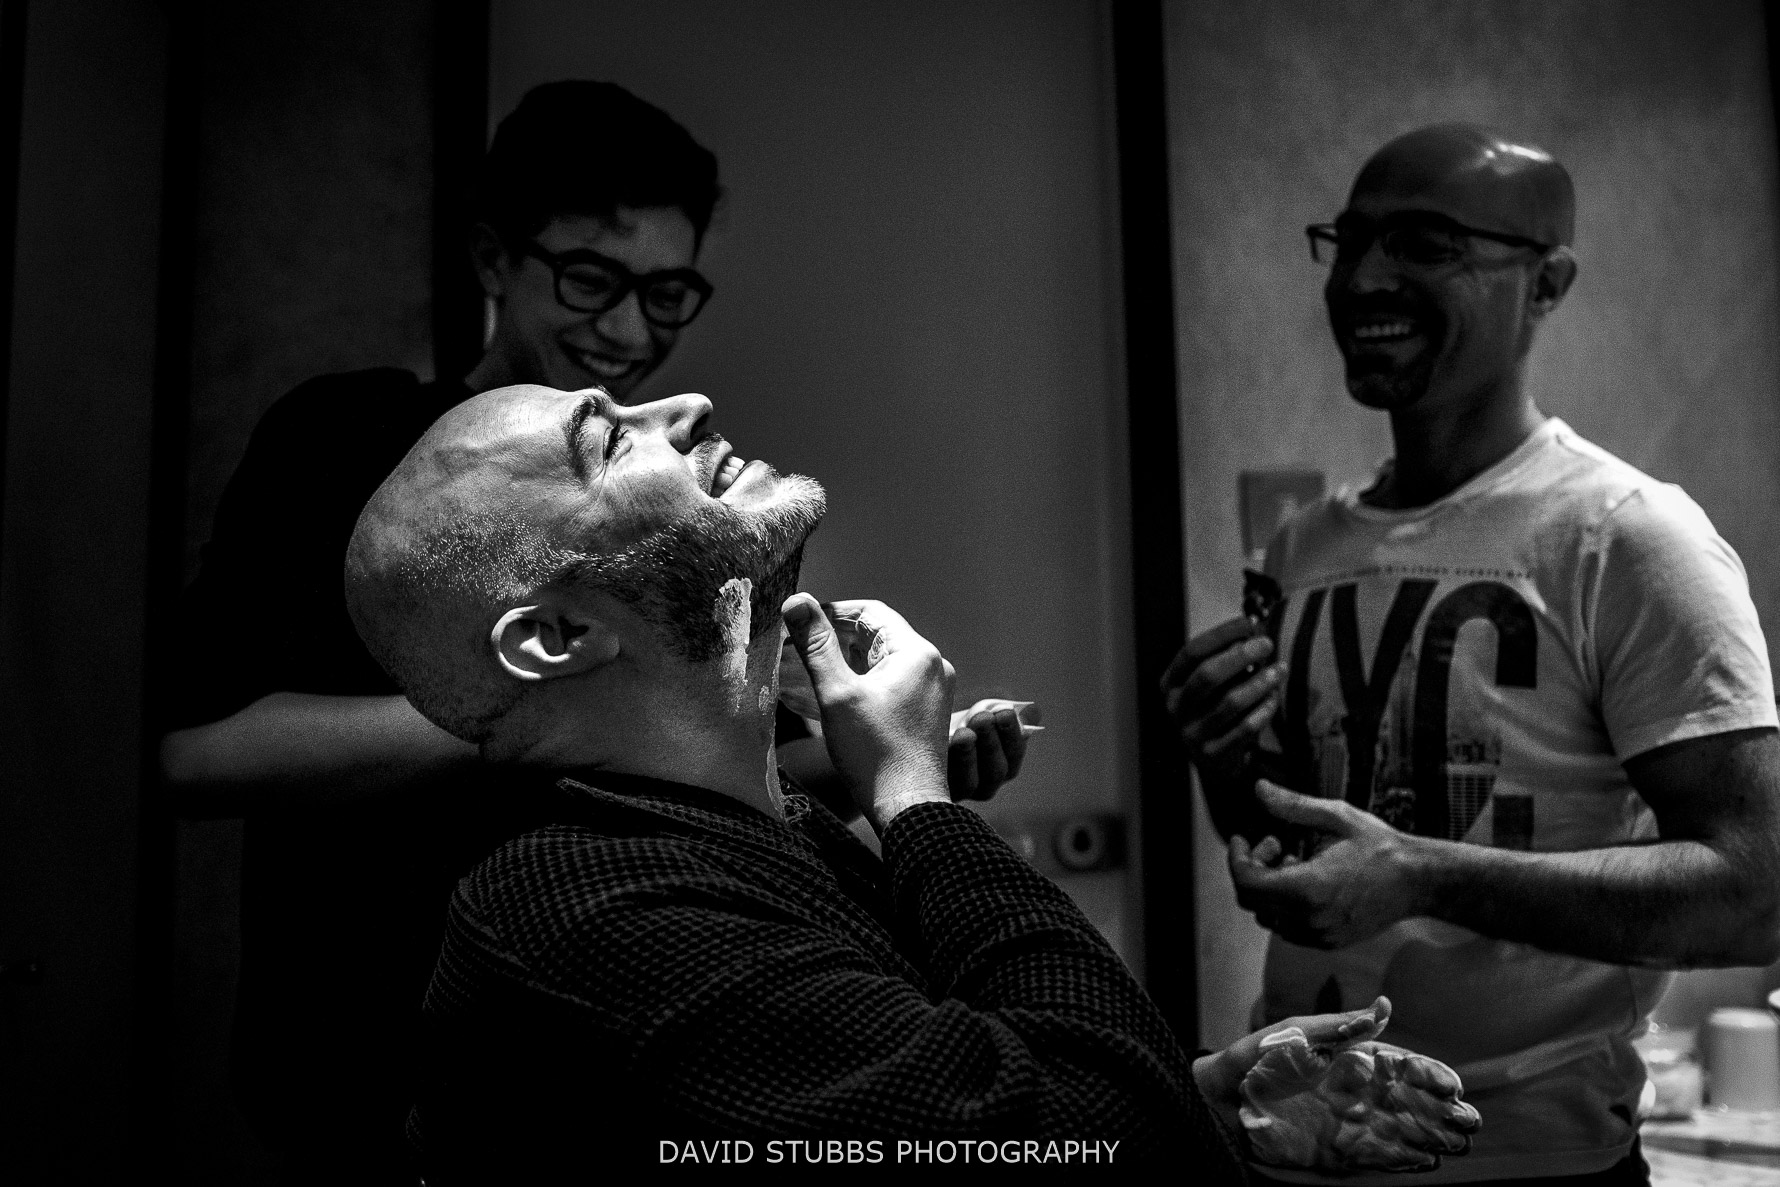 shaving in black and white